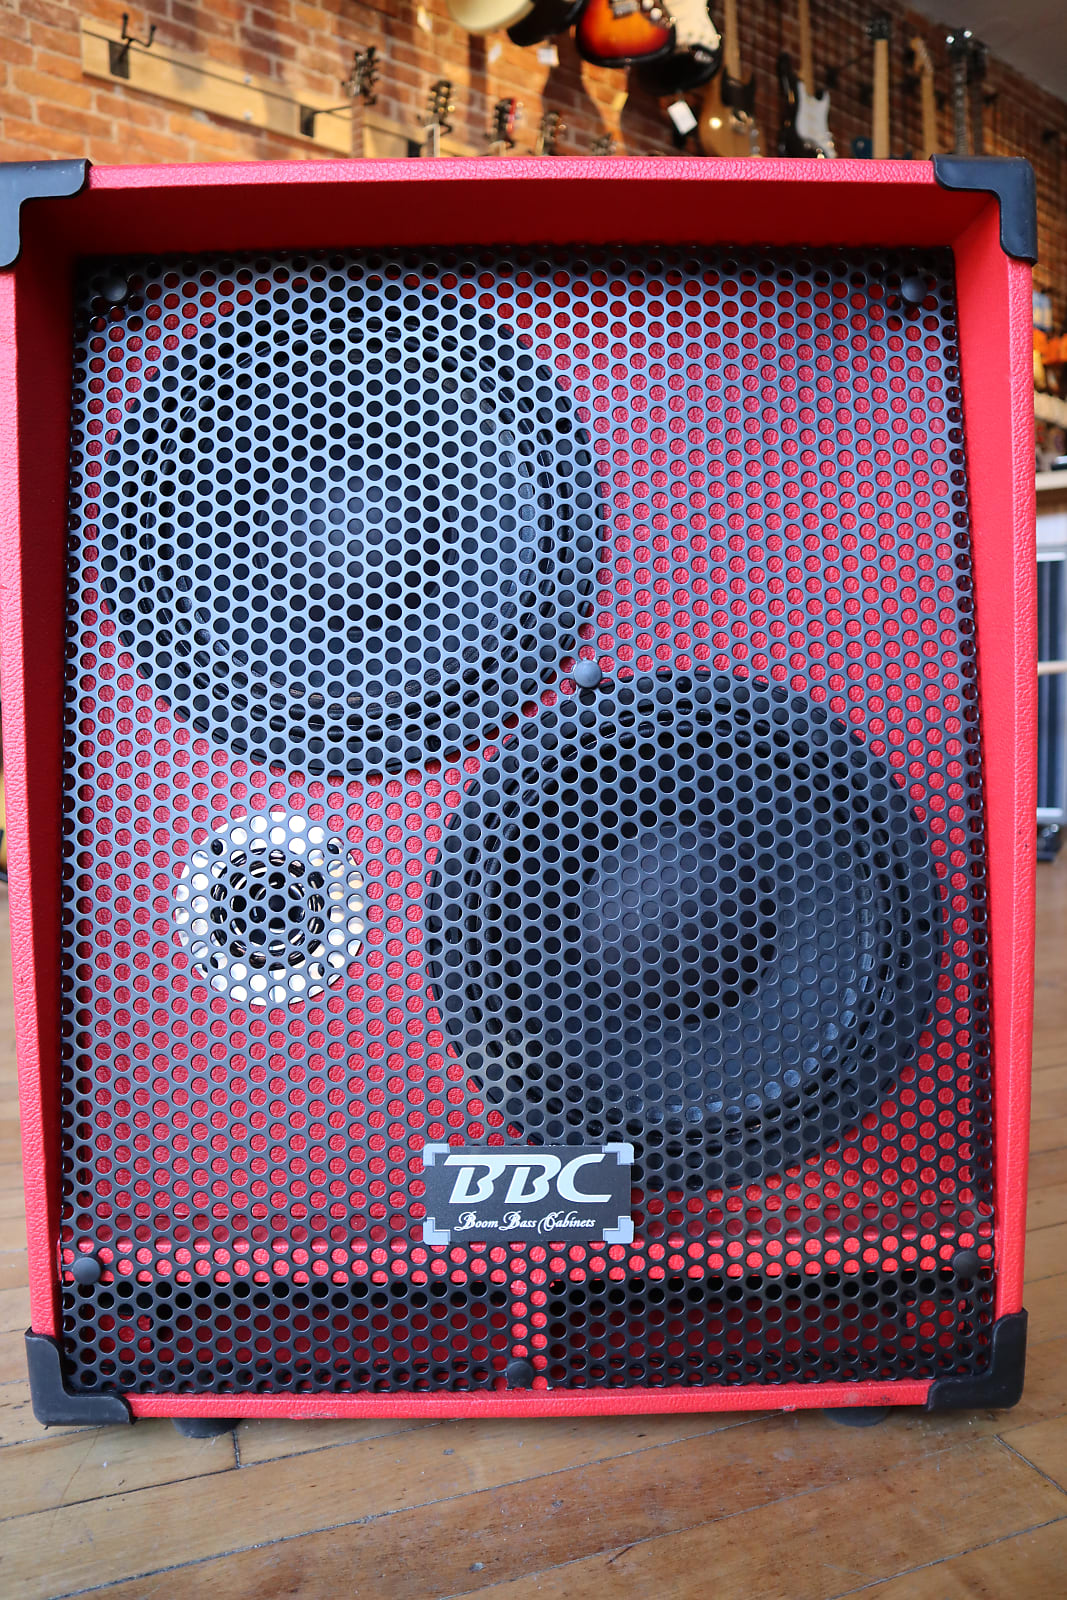 Boom Bass Cabinets Matrix 2x10